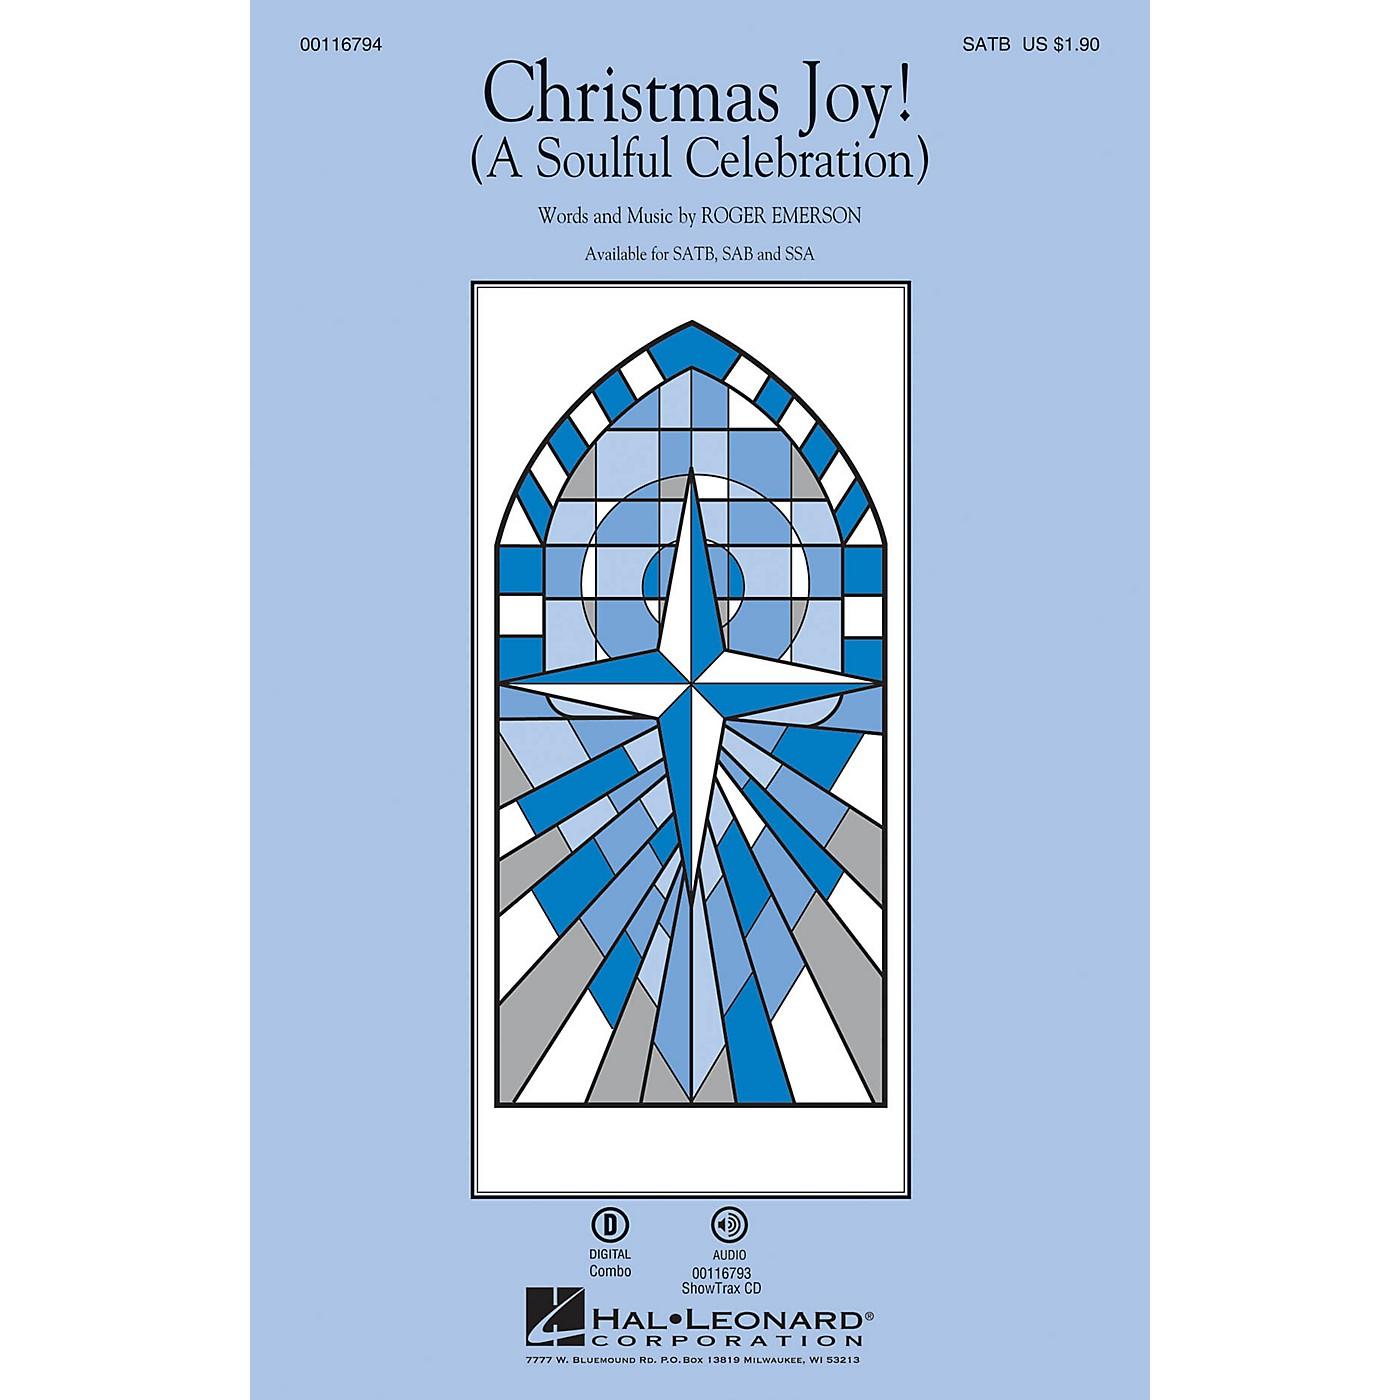 Hal Leonard Christmas Joy! (A Soulful Celebration) SATB composed by Roger Emerson thumbnail